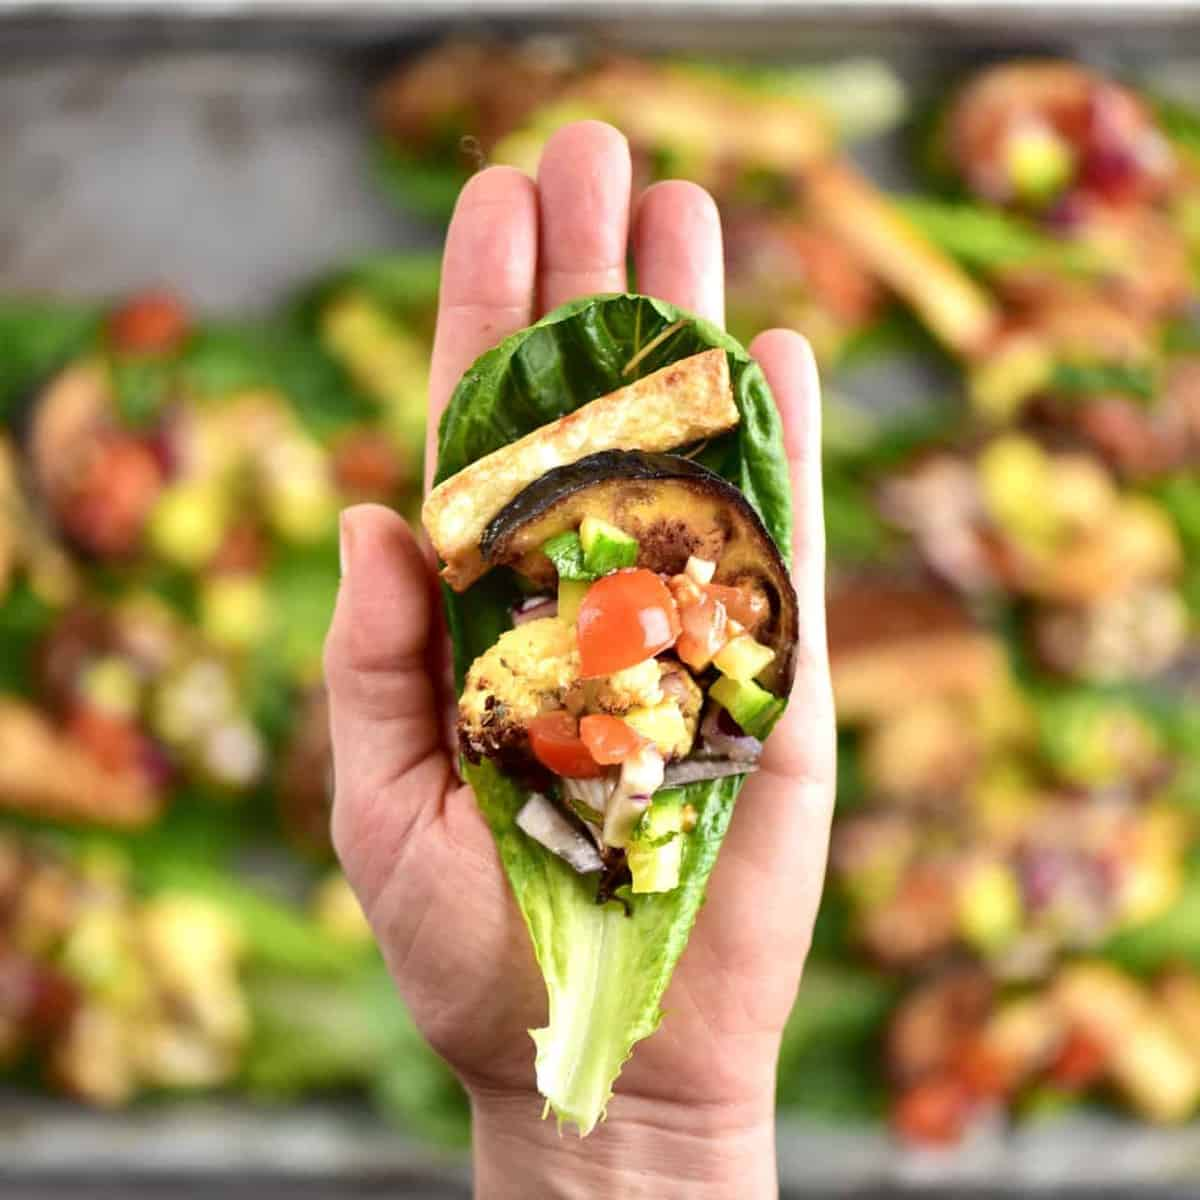 holding lettuce boat in hand with Mediterranean veg